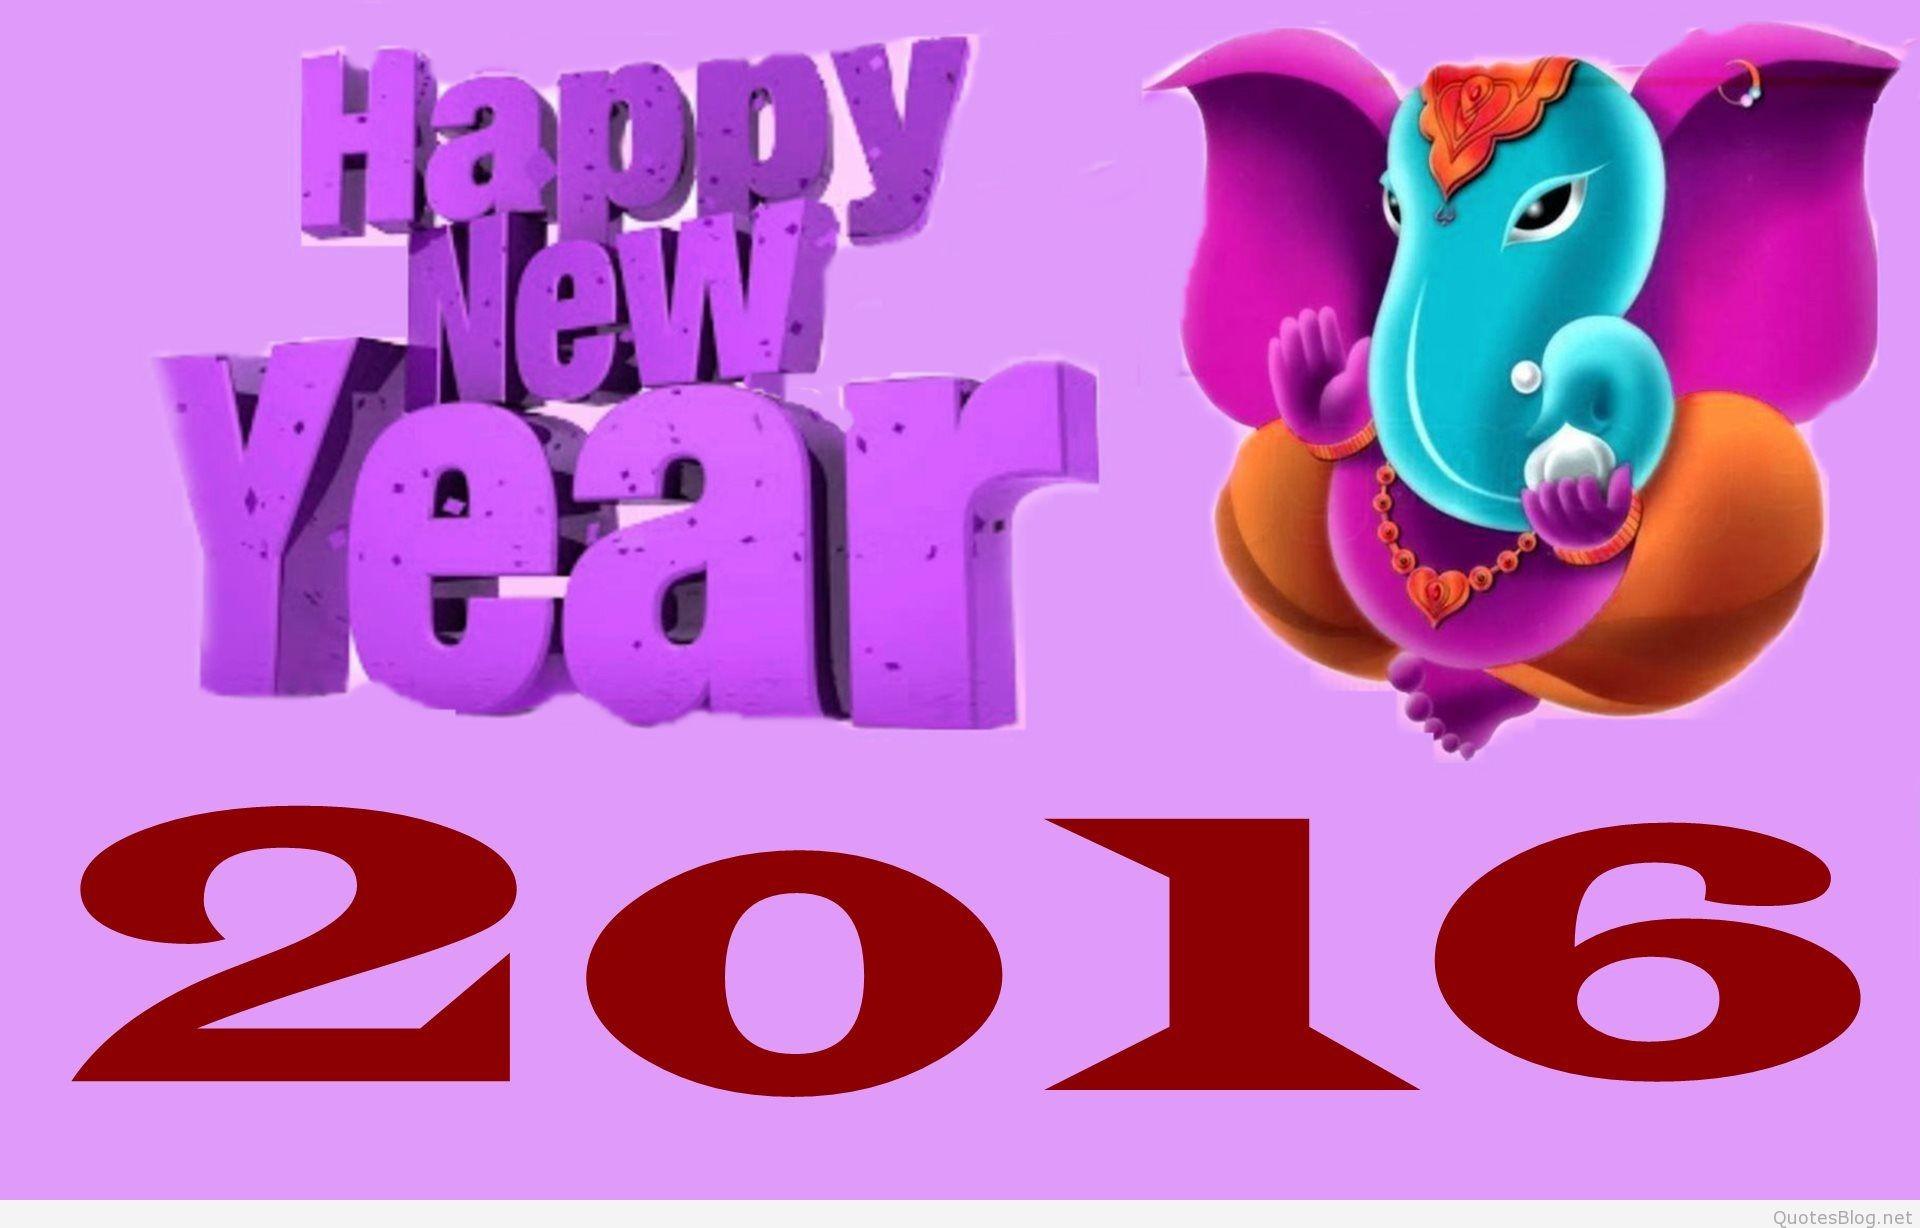 Happy-New-Year-2016-Download-Free-Desktop-Wallpapers-